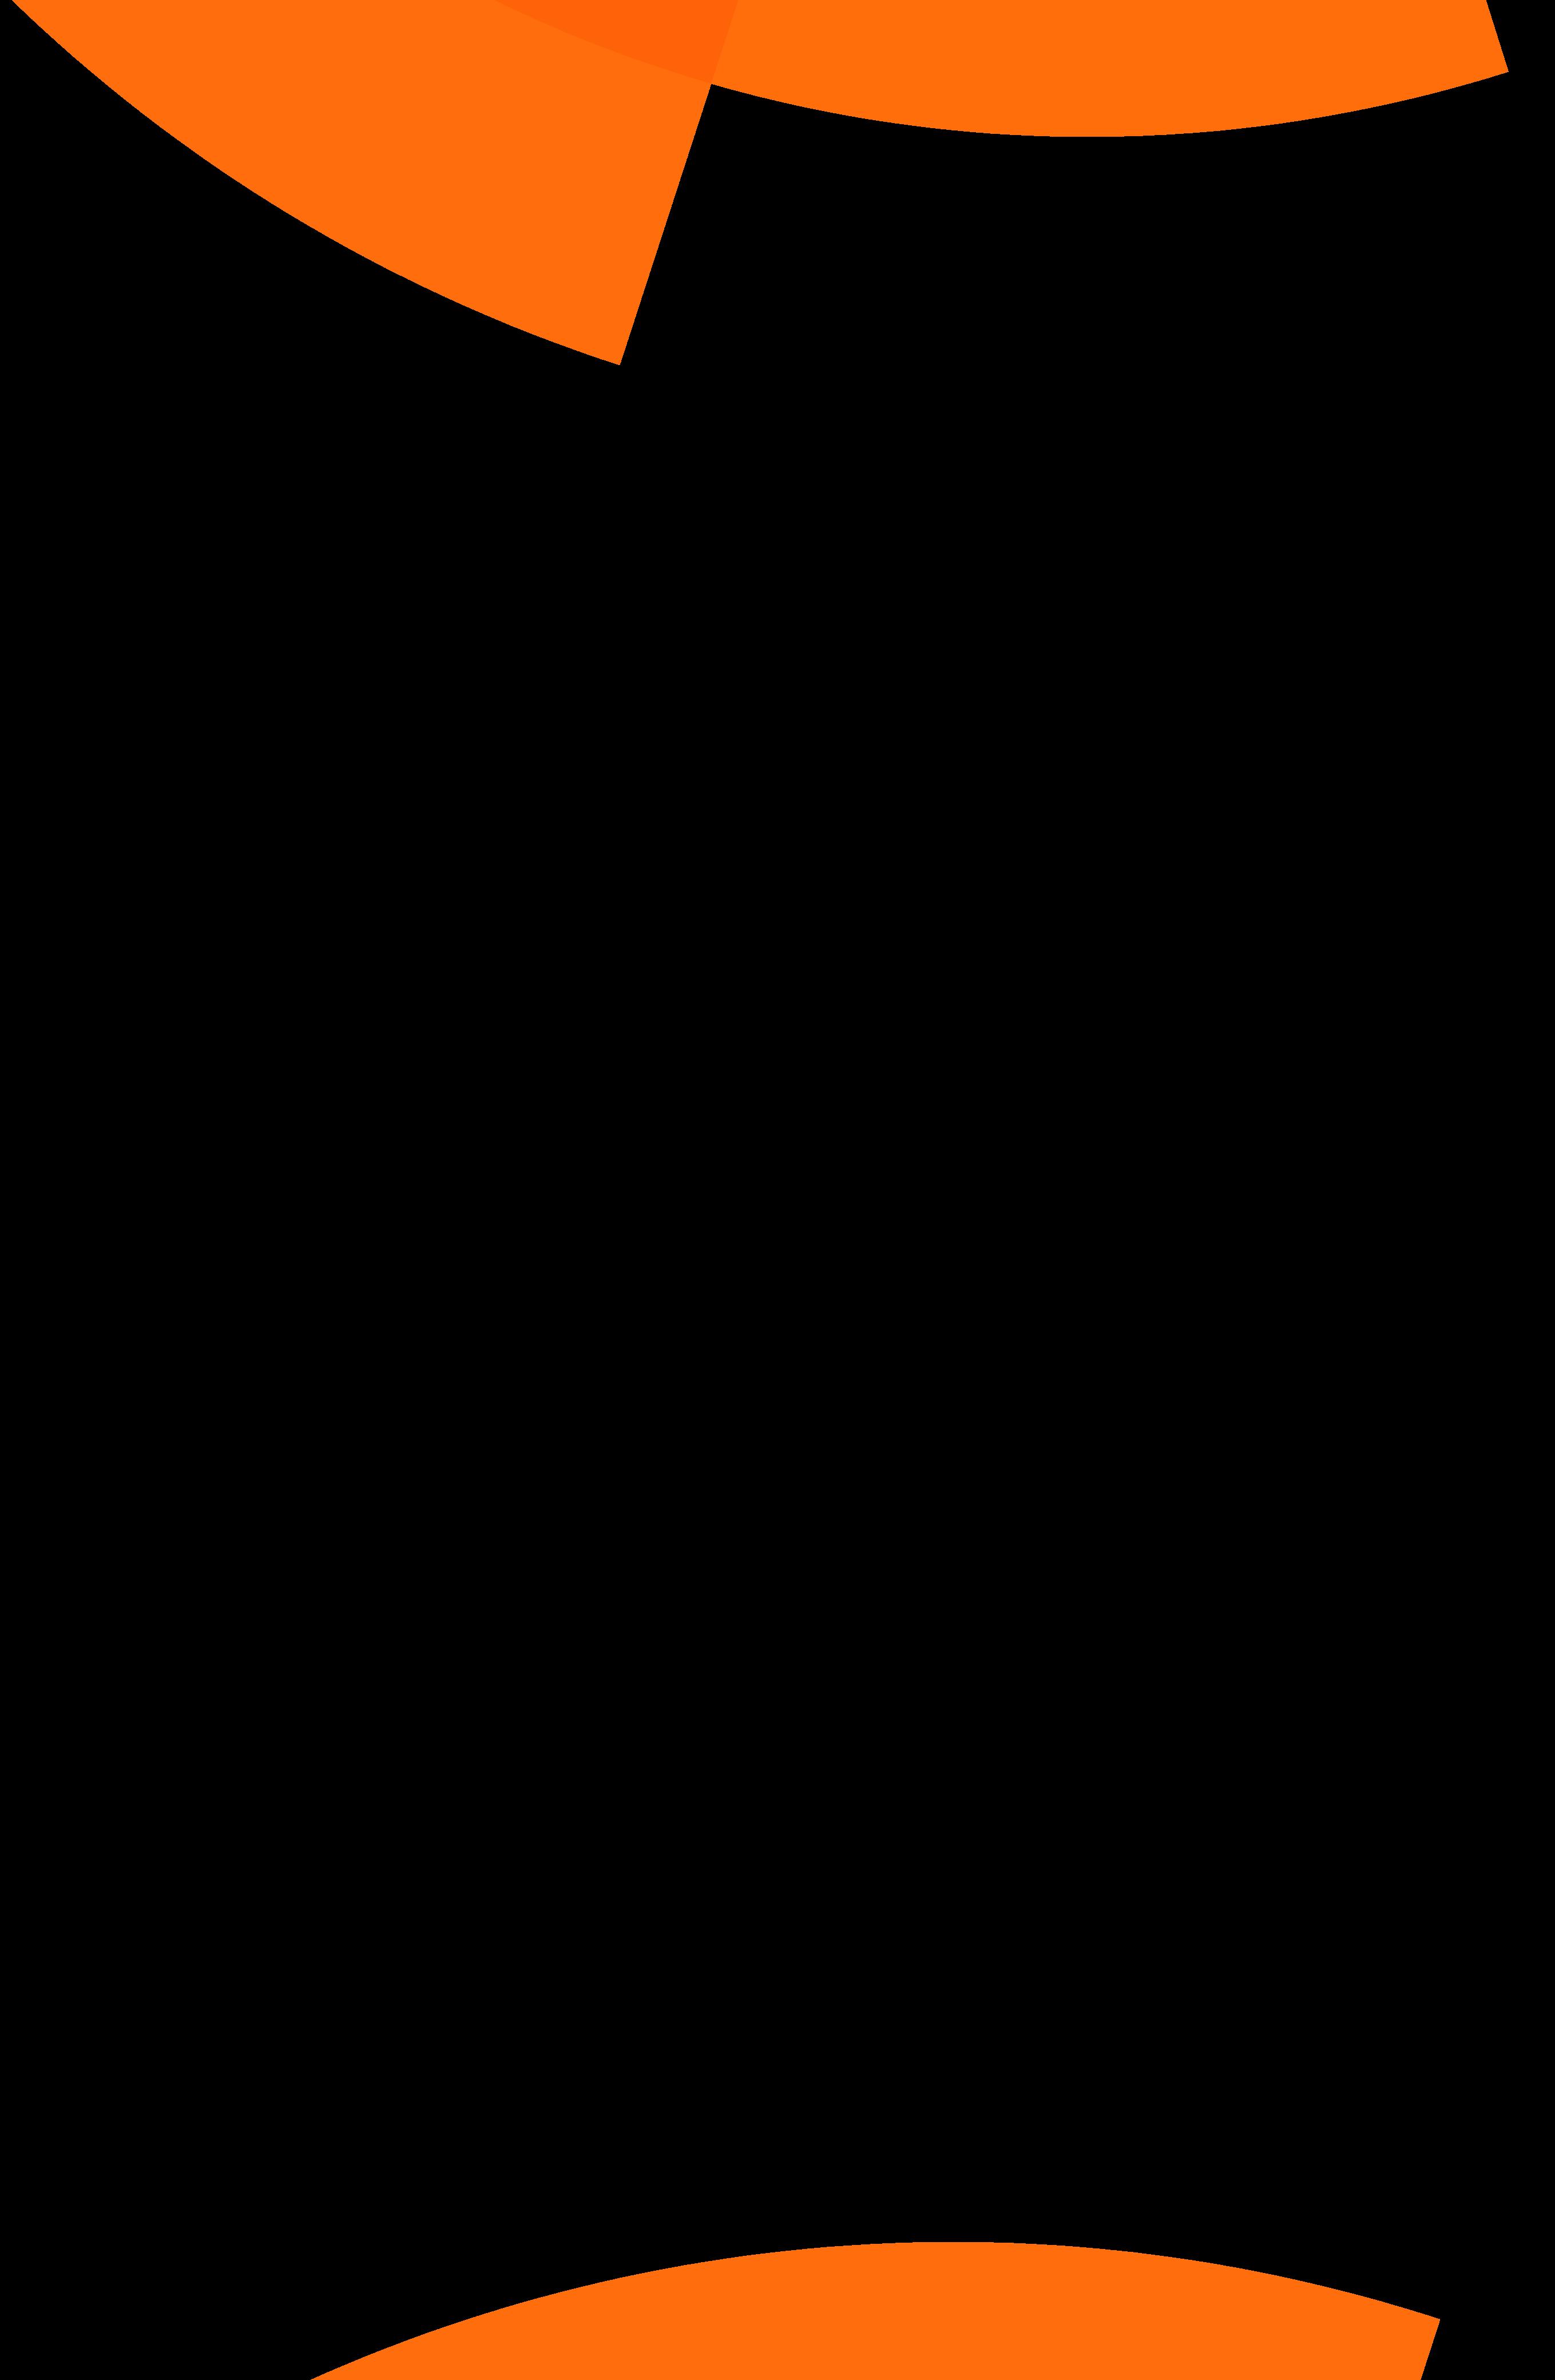 bg-top-pattern